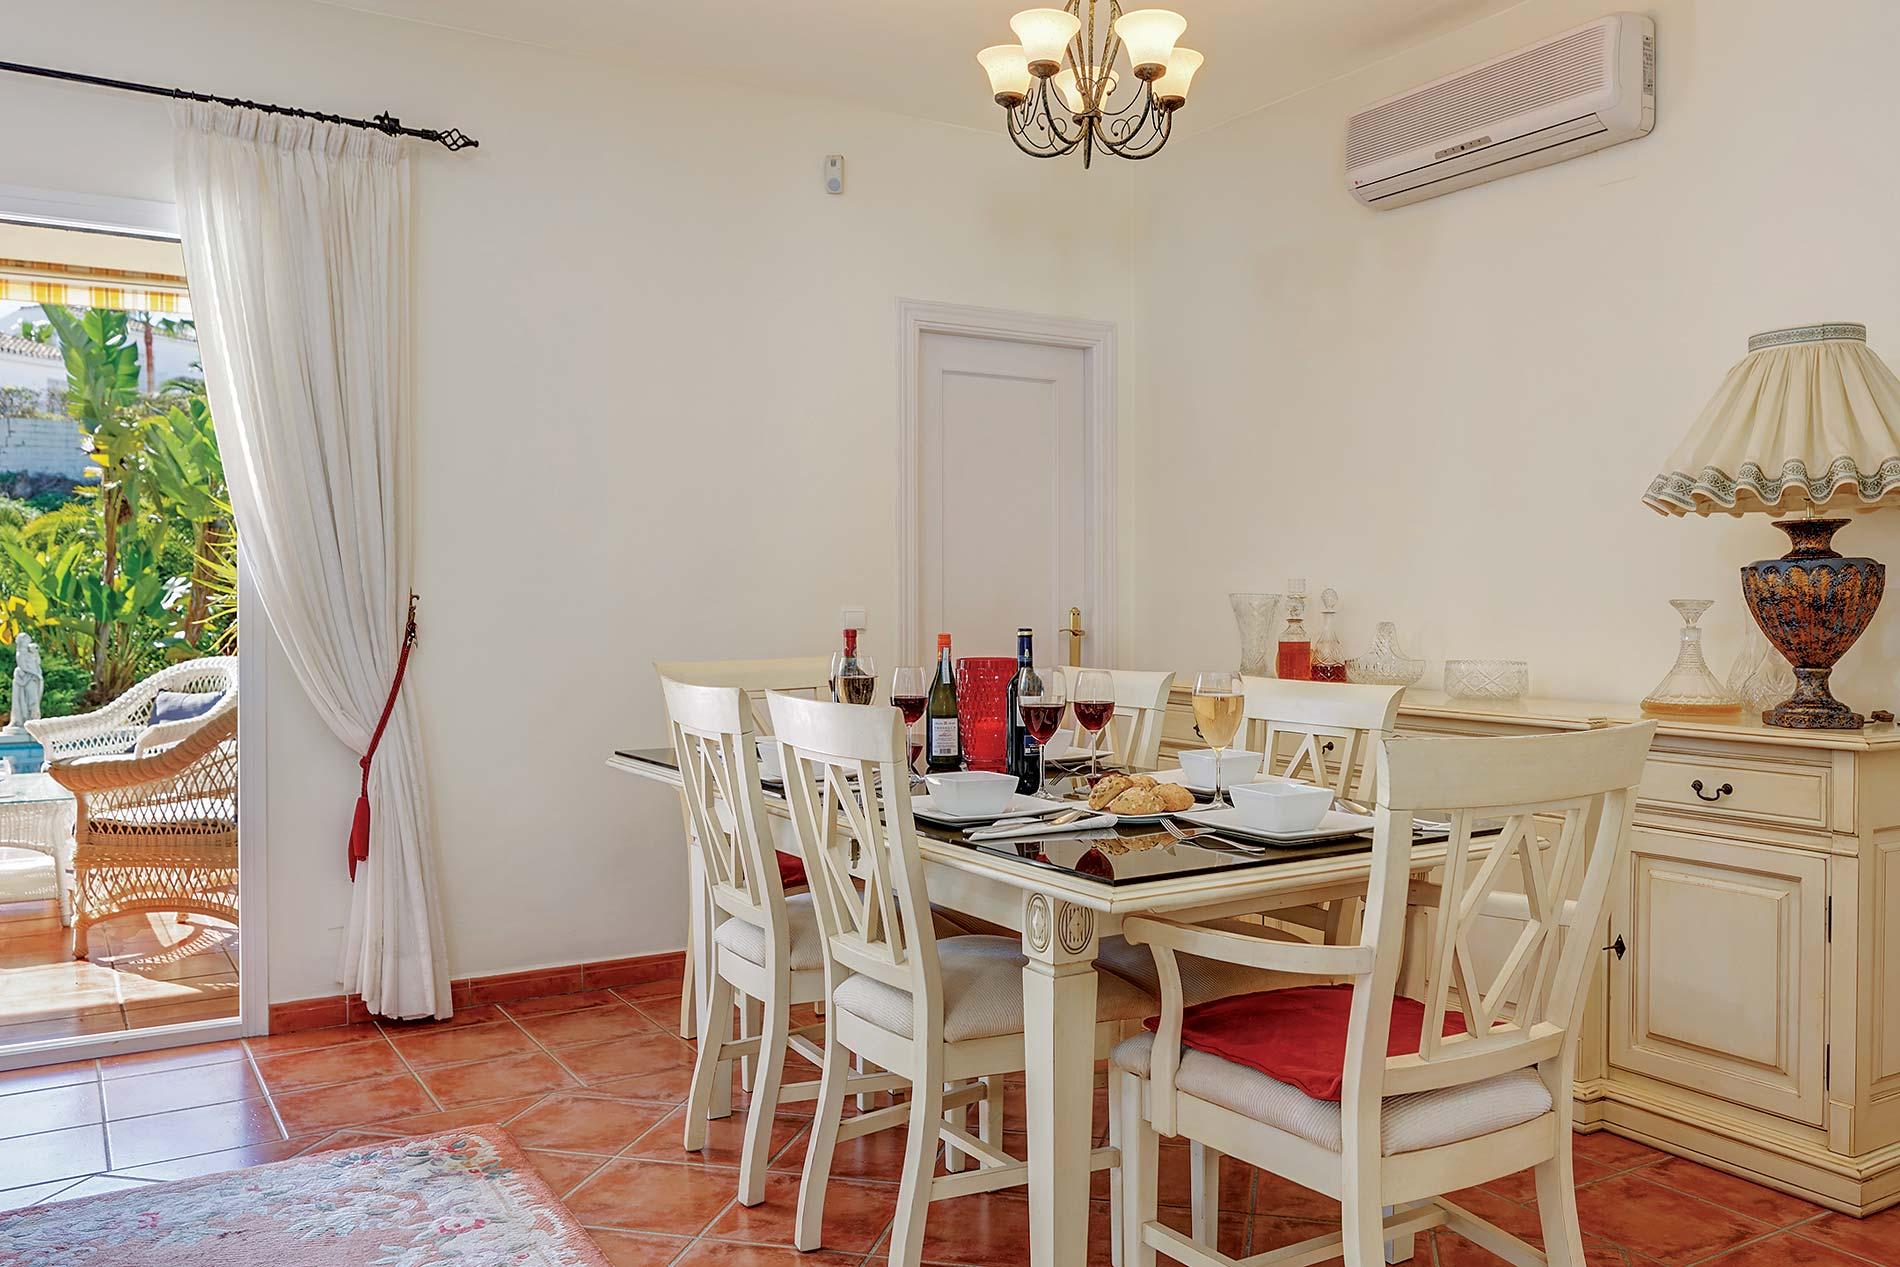 Villa Casa Cristina in Calahonda - sleeps 6 people